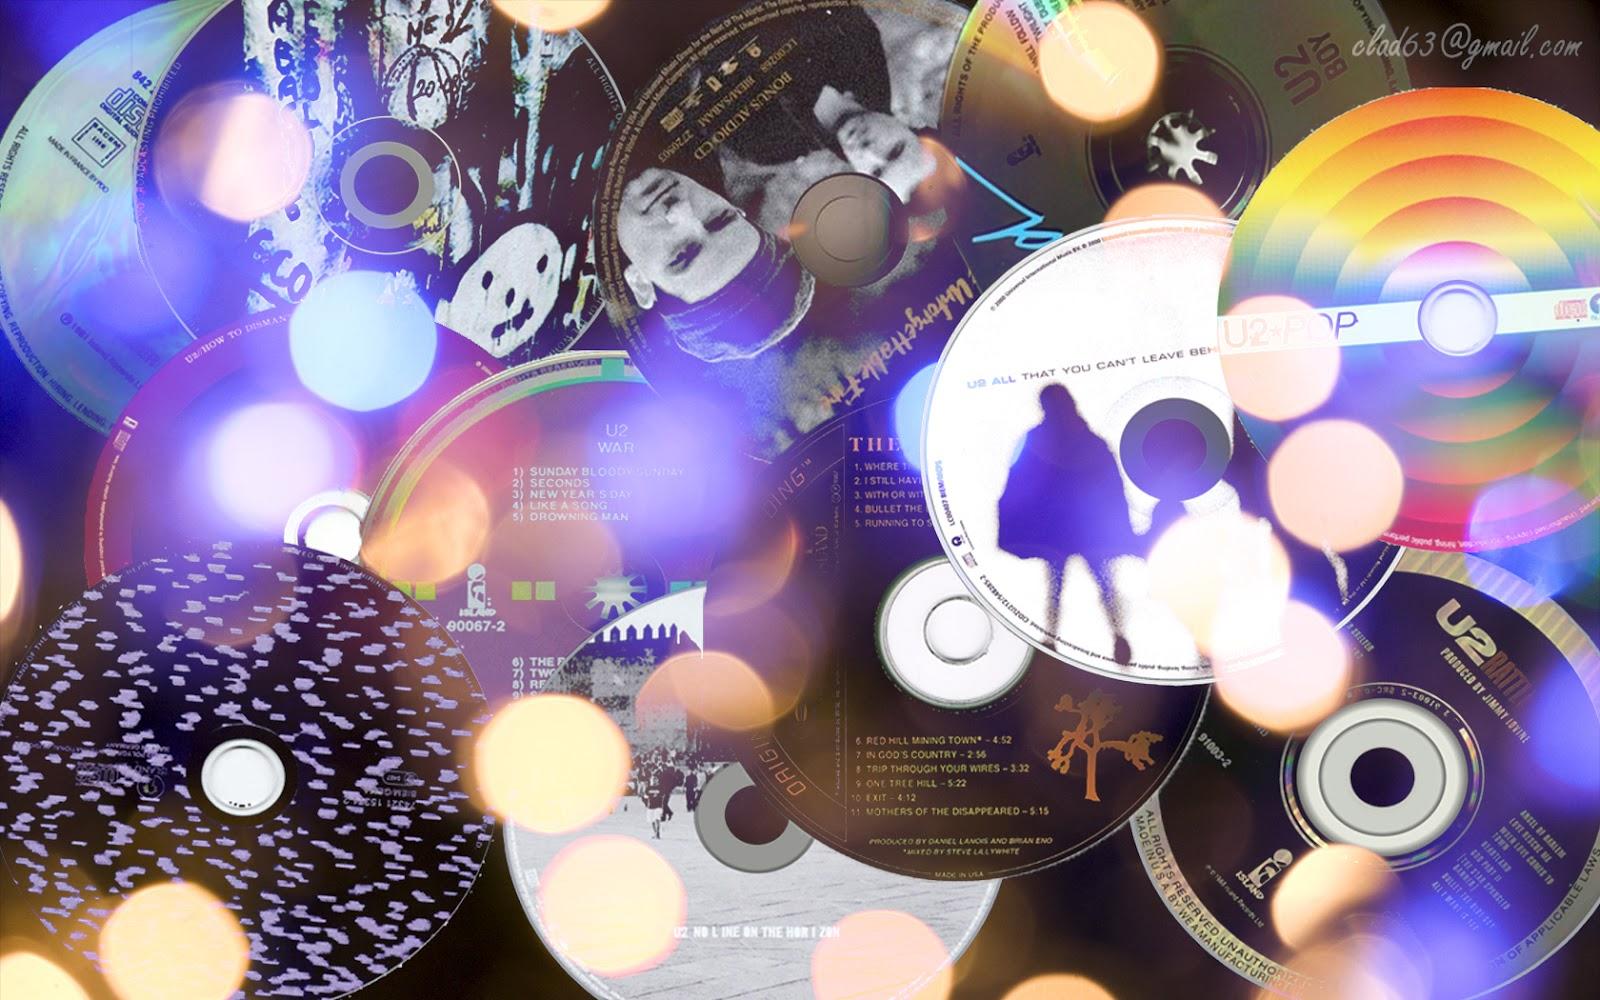 http://2.bp.blogspot.com/-_rIGc09lqTM/UEW2_p6DnSI/AAAAAAAABLA/CM9xchu9GiA/s1600/fond+disco.jpg